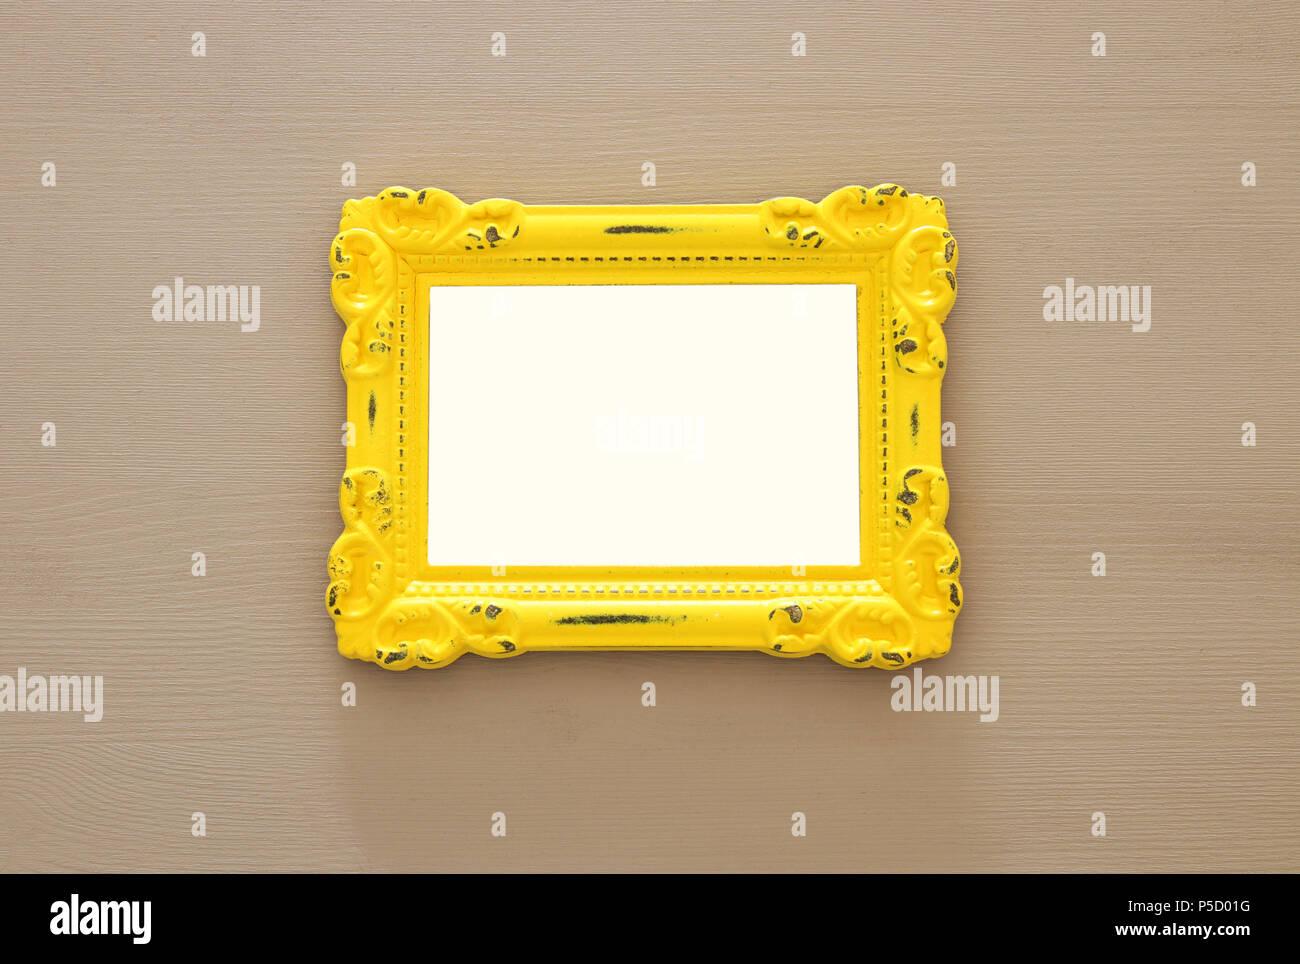 Decó Stockfotos & Decó Bilder - Seite 106 - Alamy